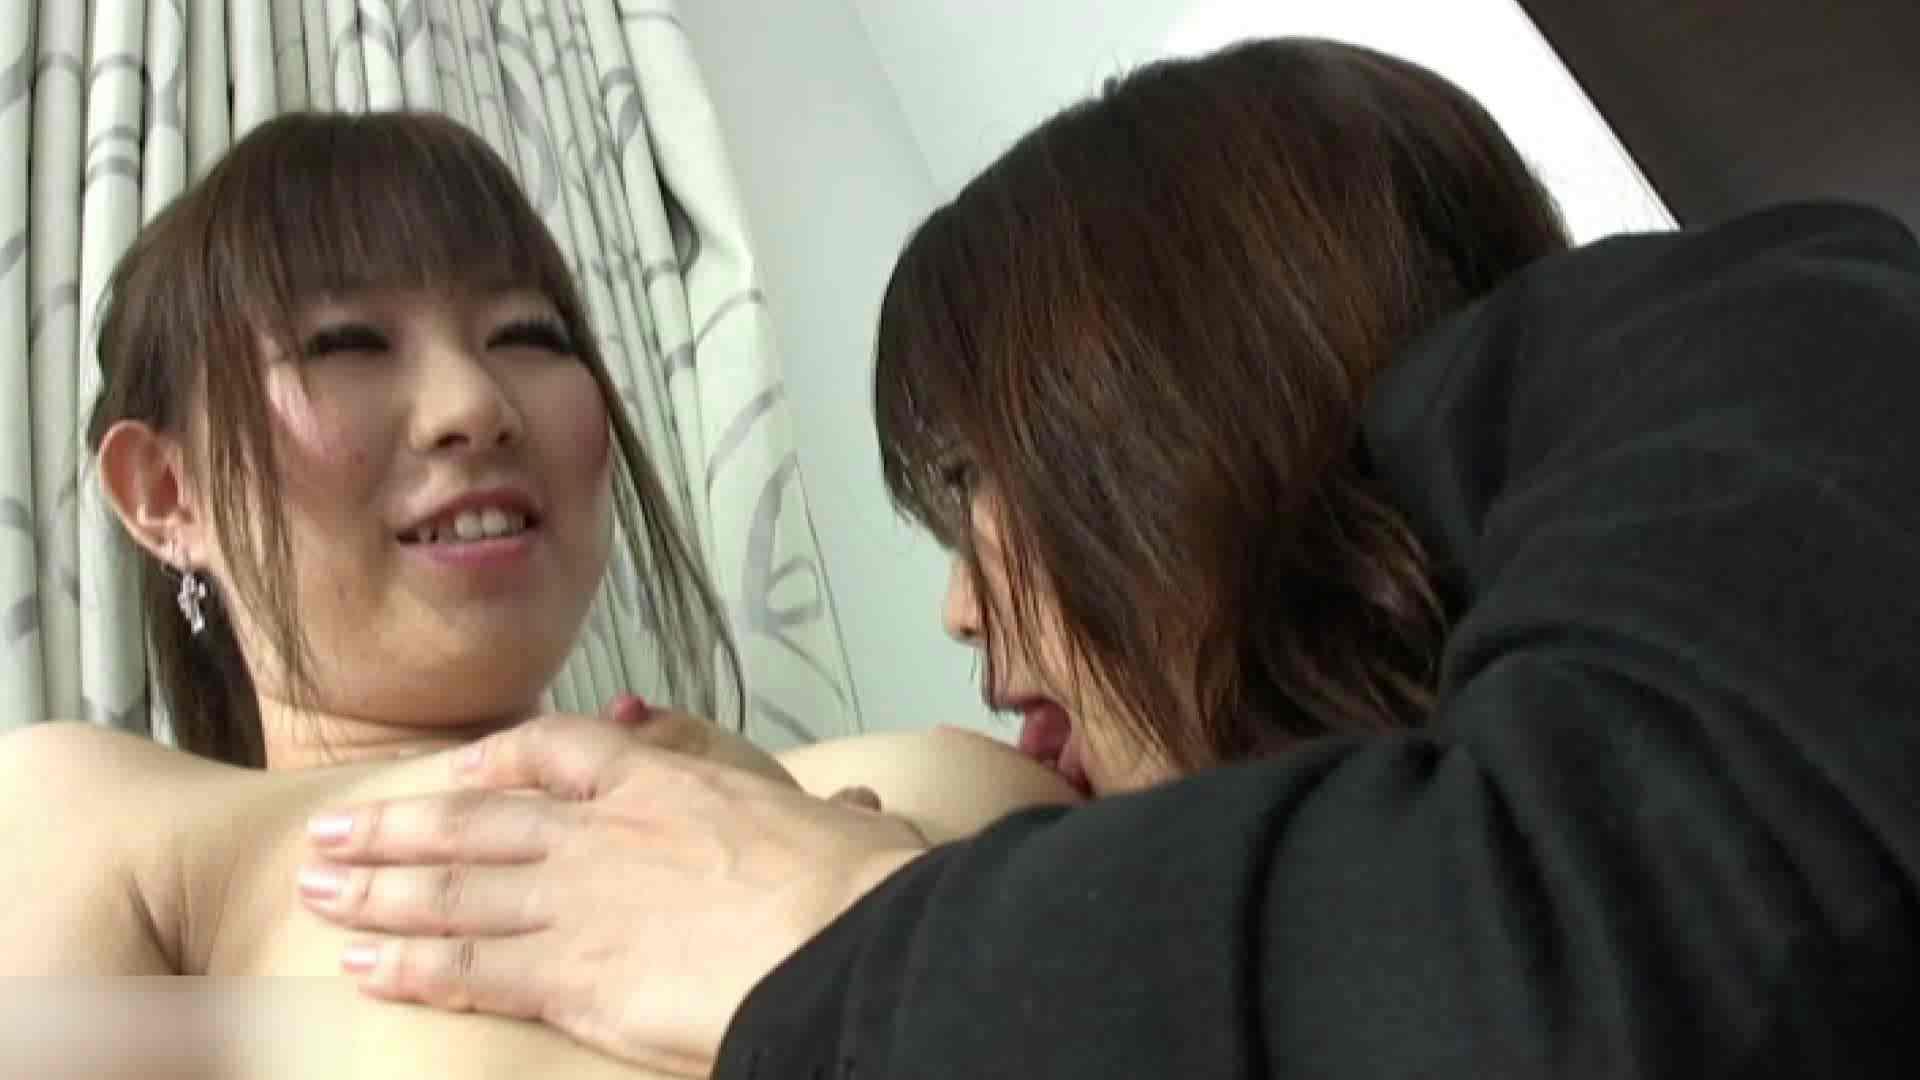 人妻3P物語 Vol.02 淫乱人妻 | 3P  101pic 35